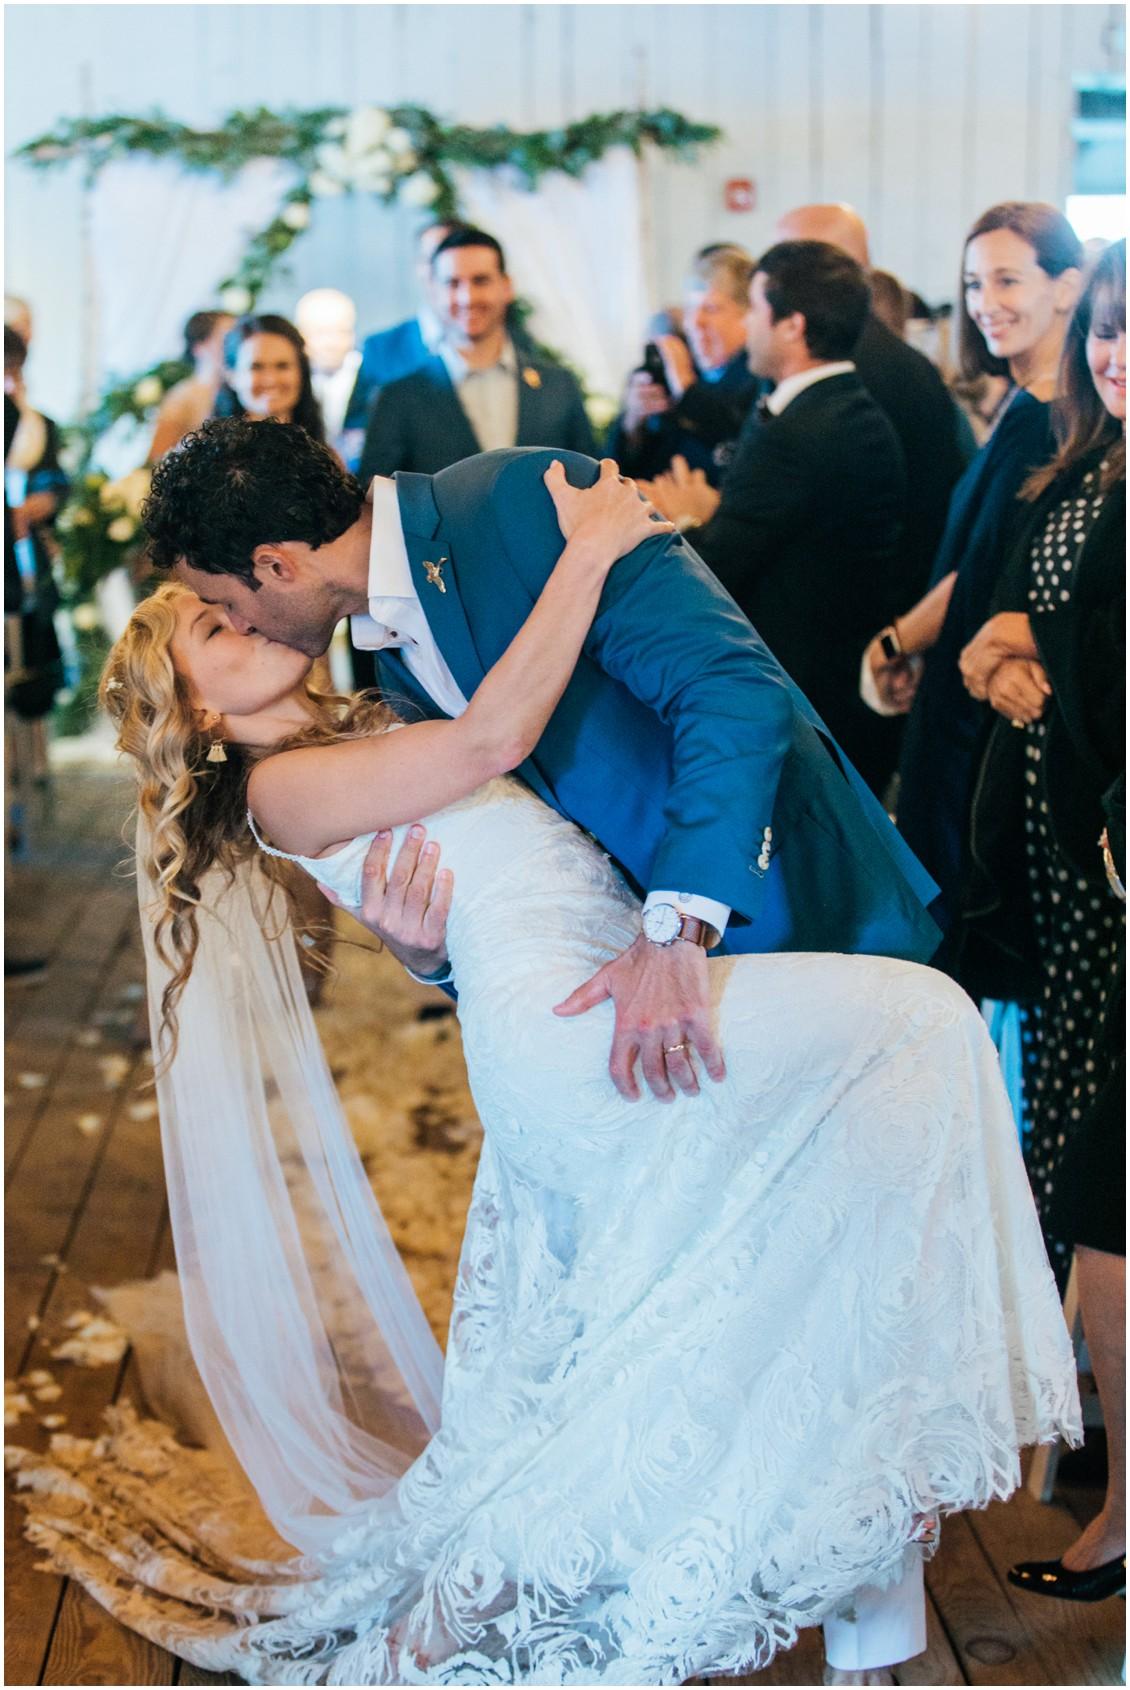 Bride and groom kissing | My Eastern Shore Wedding | Chesapeake Bay Maritime Museum